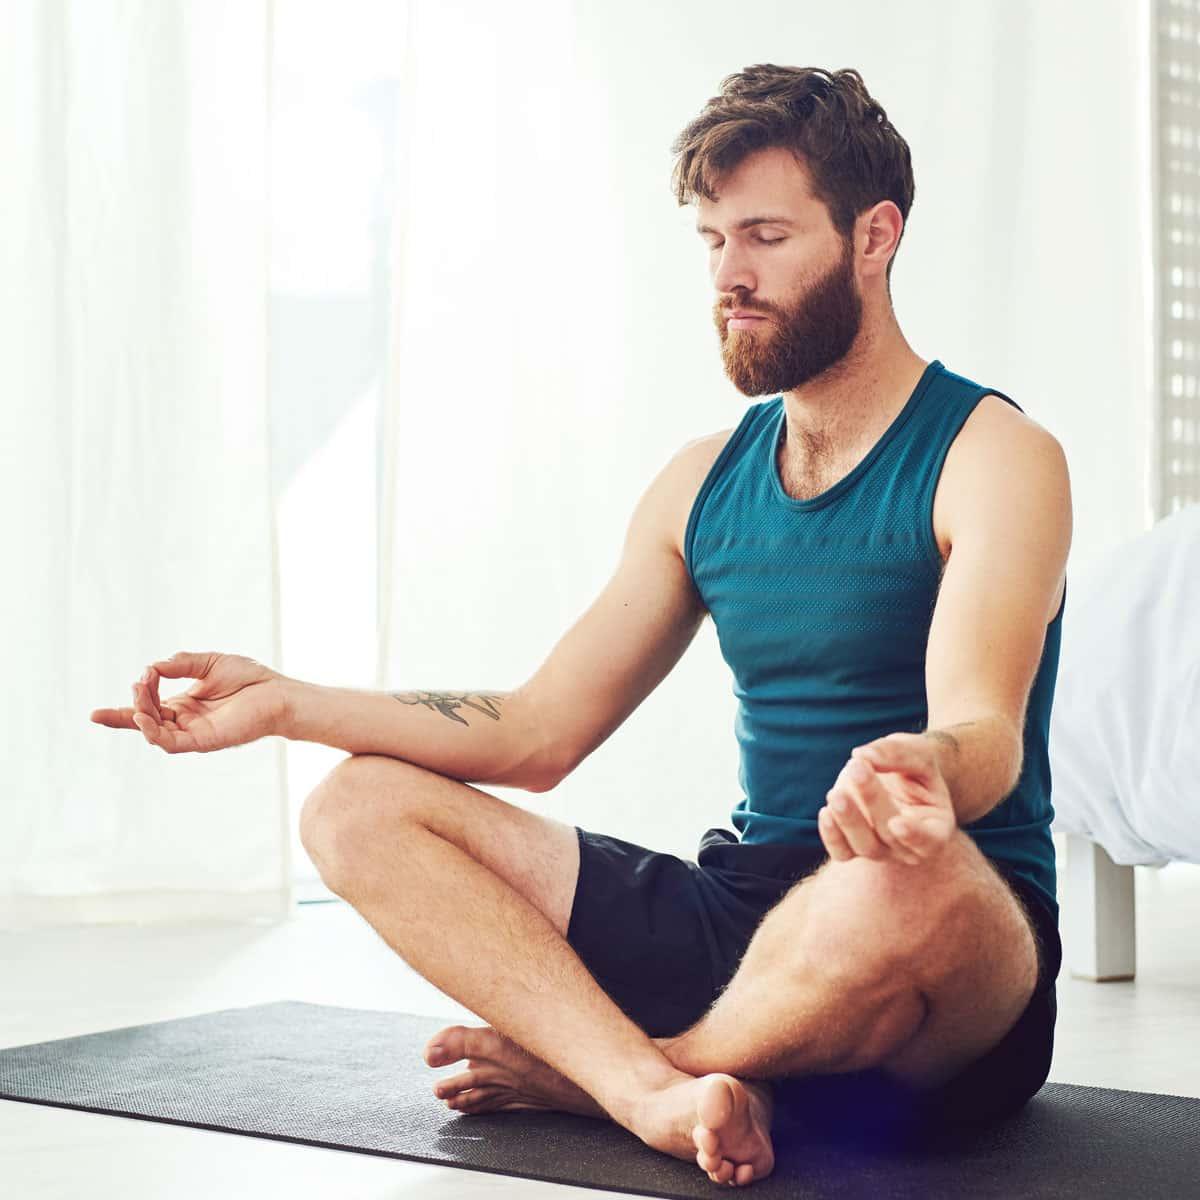 man meditating on a yoga mat